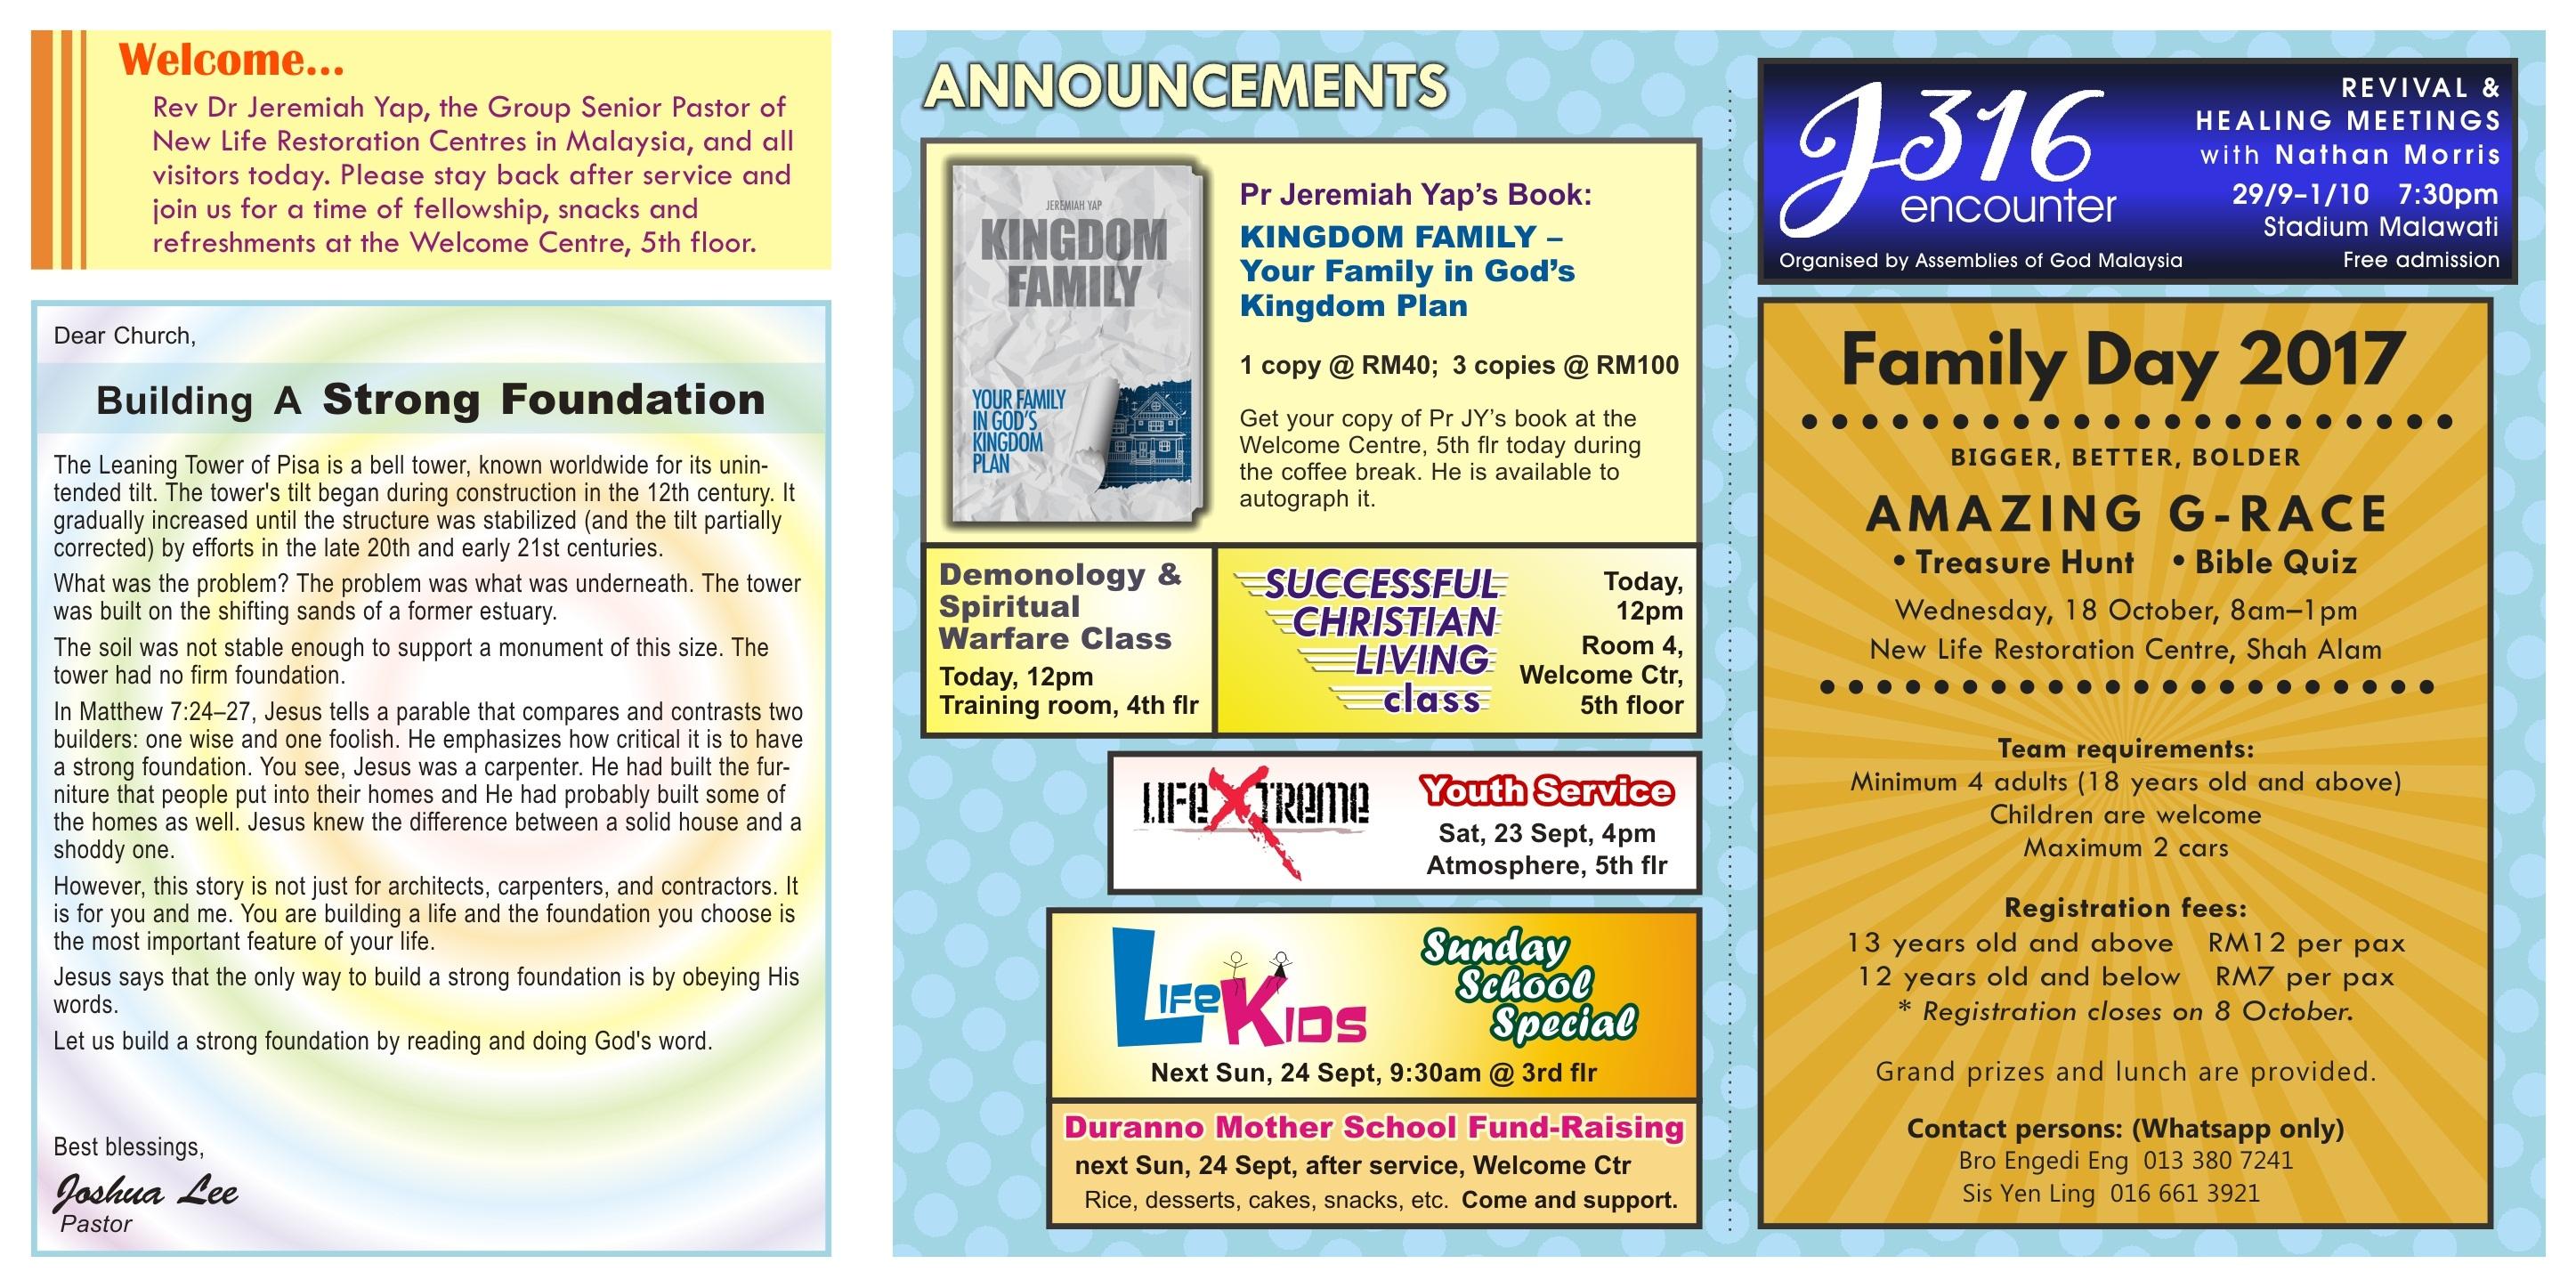 New Life Restoration Centre Shah Alam Bulletin 17th September 2017